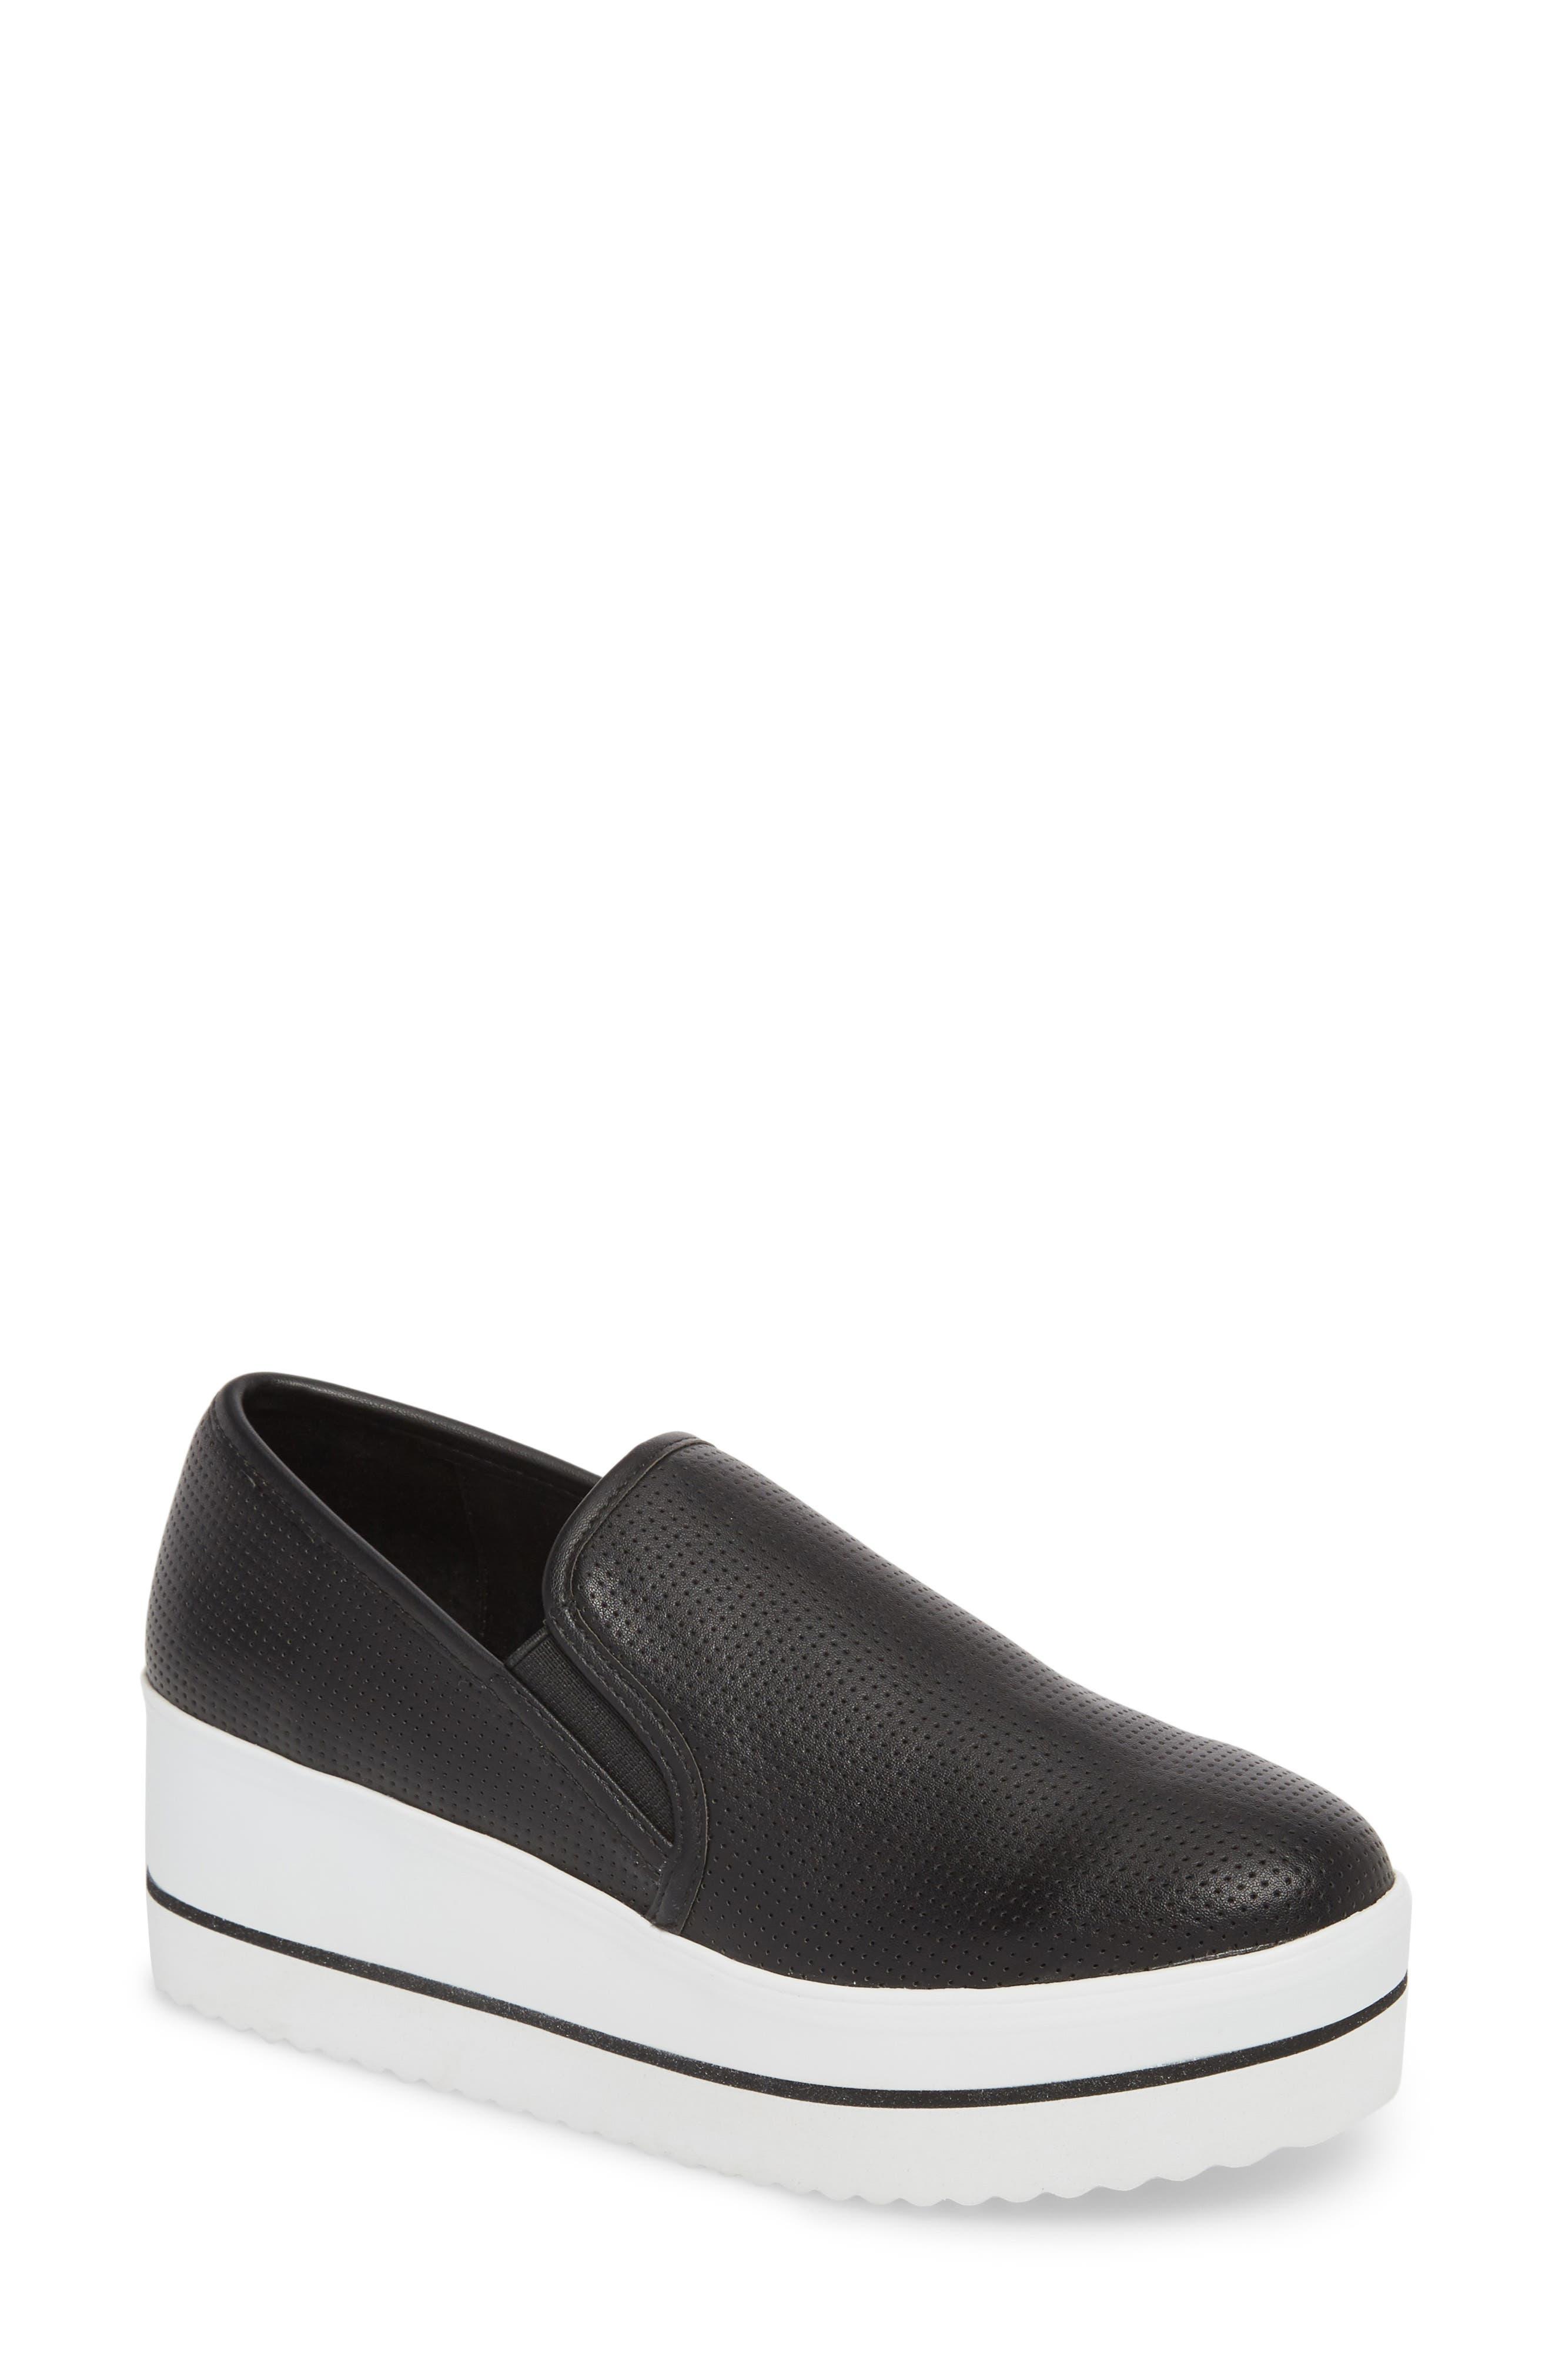 Becca Slip-On Sneaker,                         Main,                         color, Black